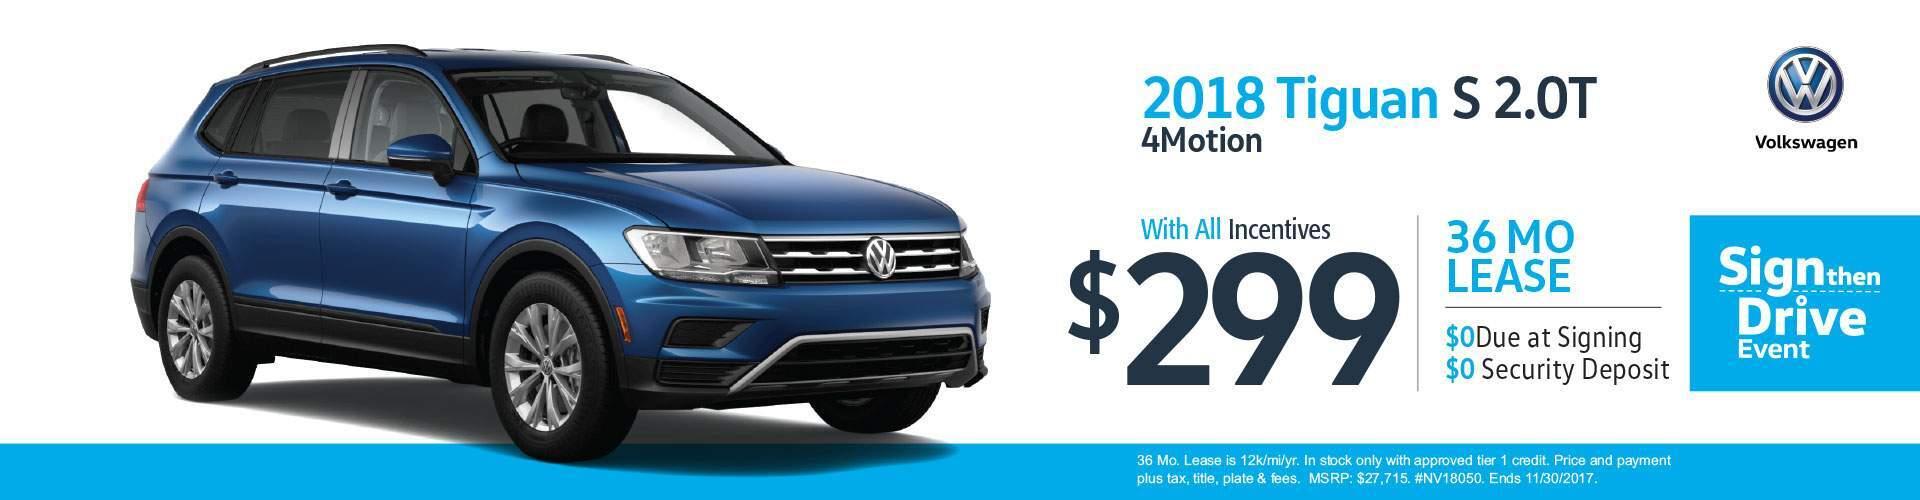 Volkswagen Dealership Pittsburgh Pa Used Cars Volkswagen